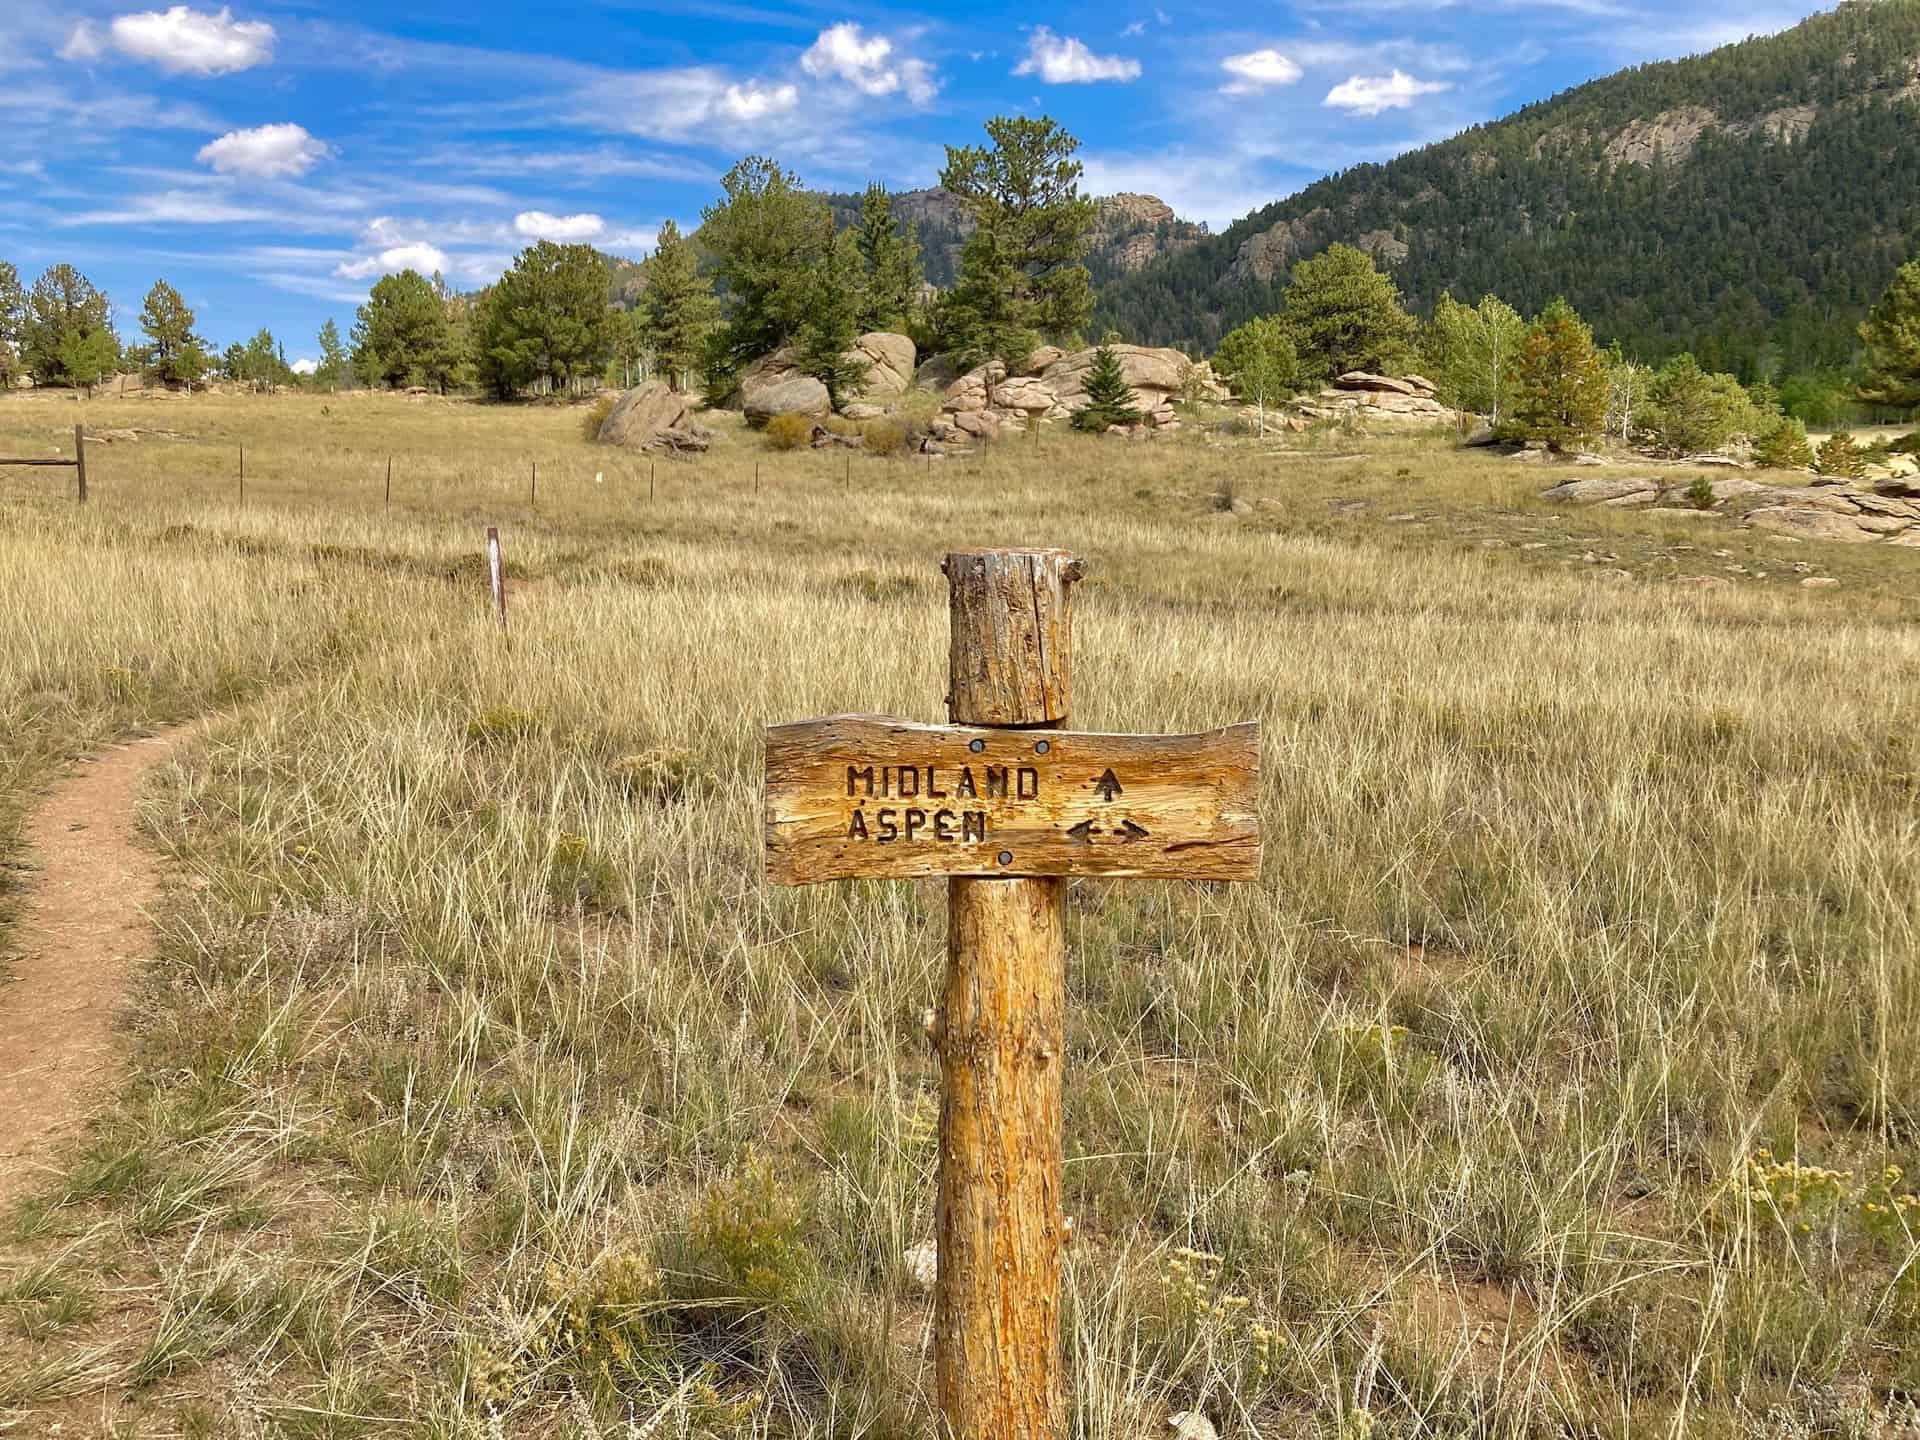 midland trail sign